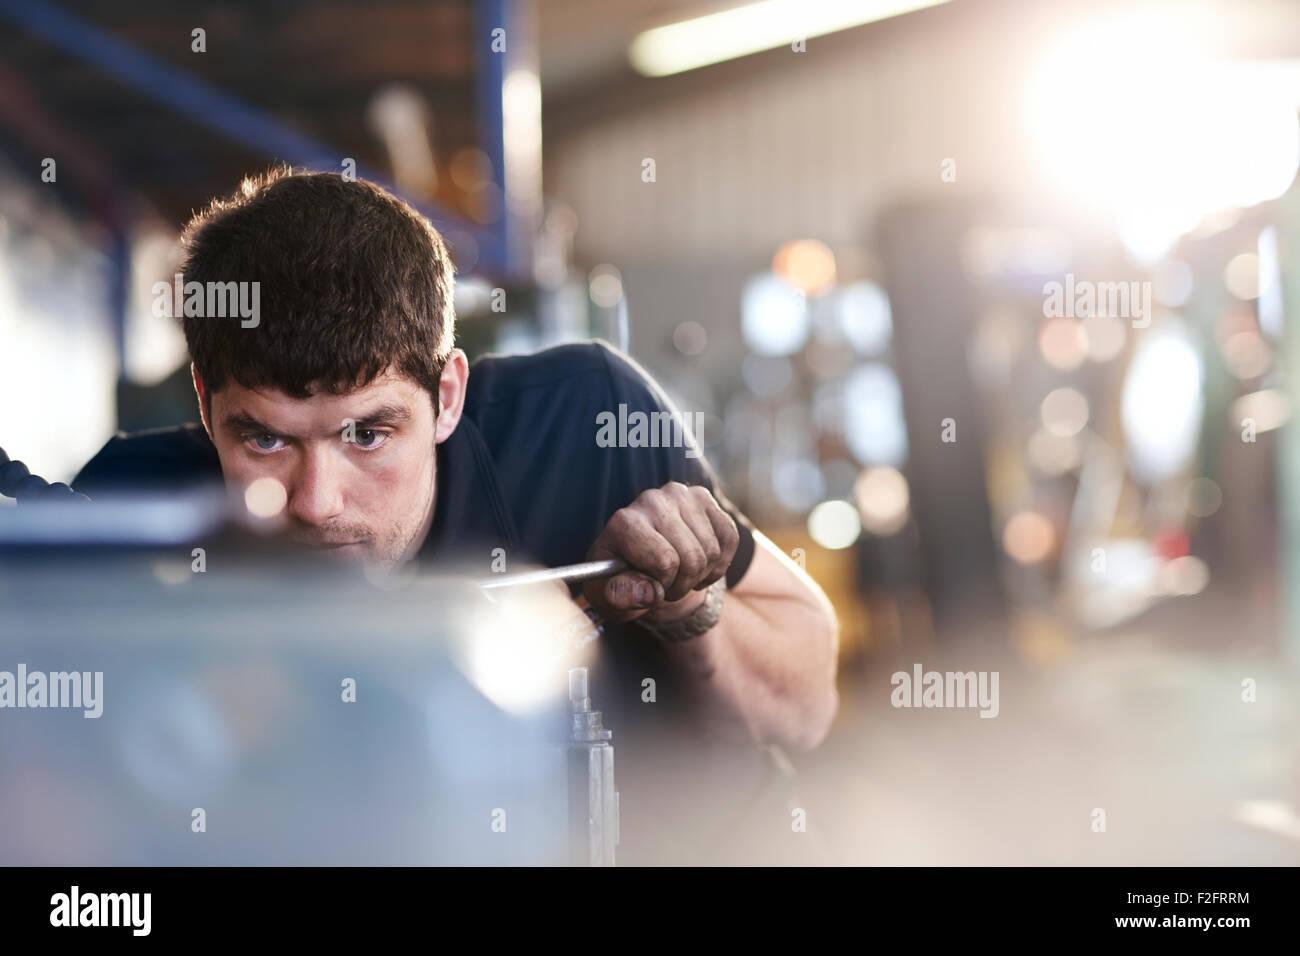 Mechanic working in auto repair shop - Stock Image